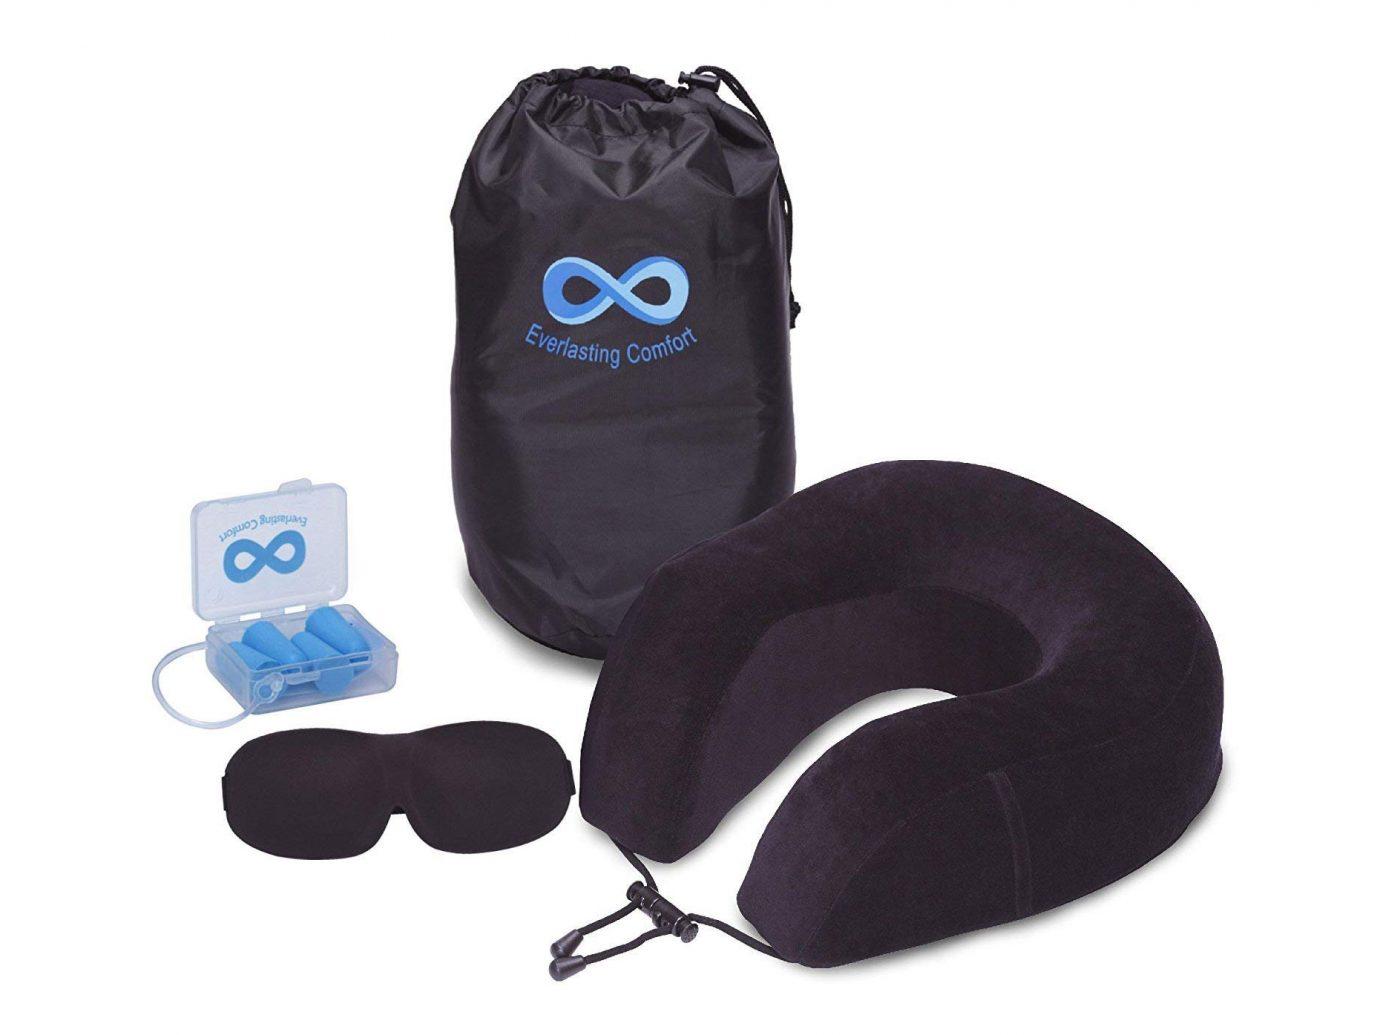 Travel pillow and eye mask set